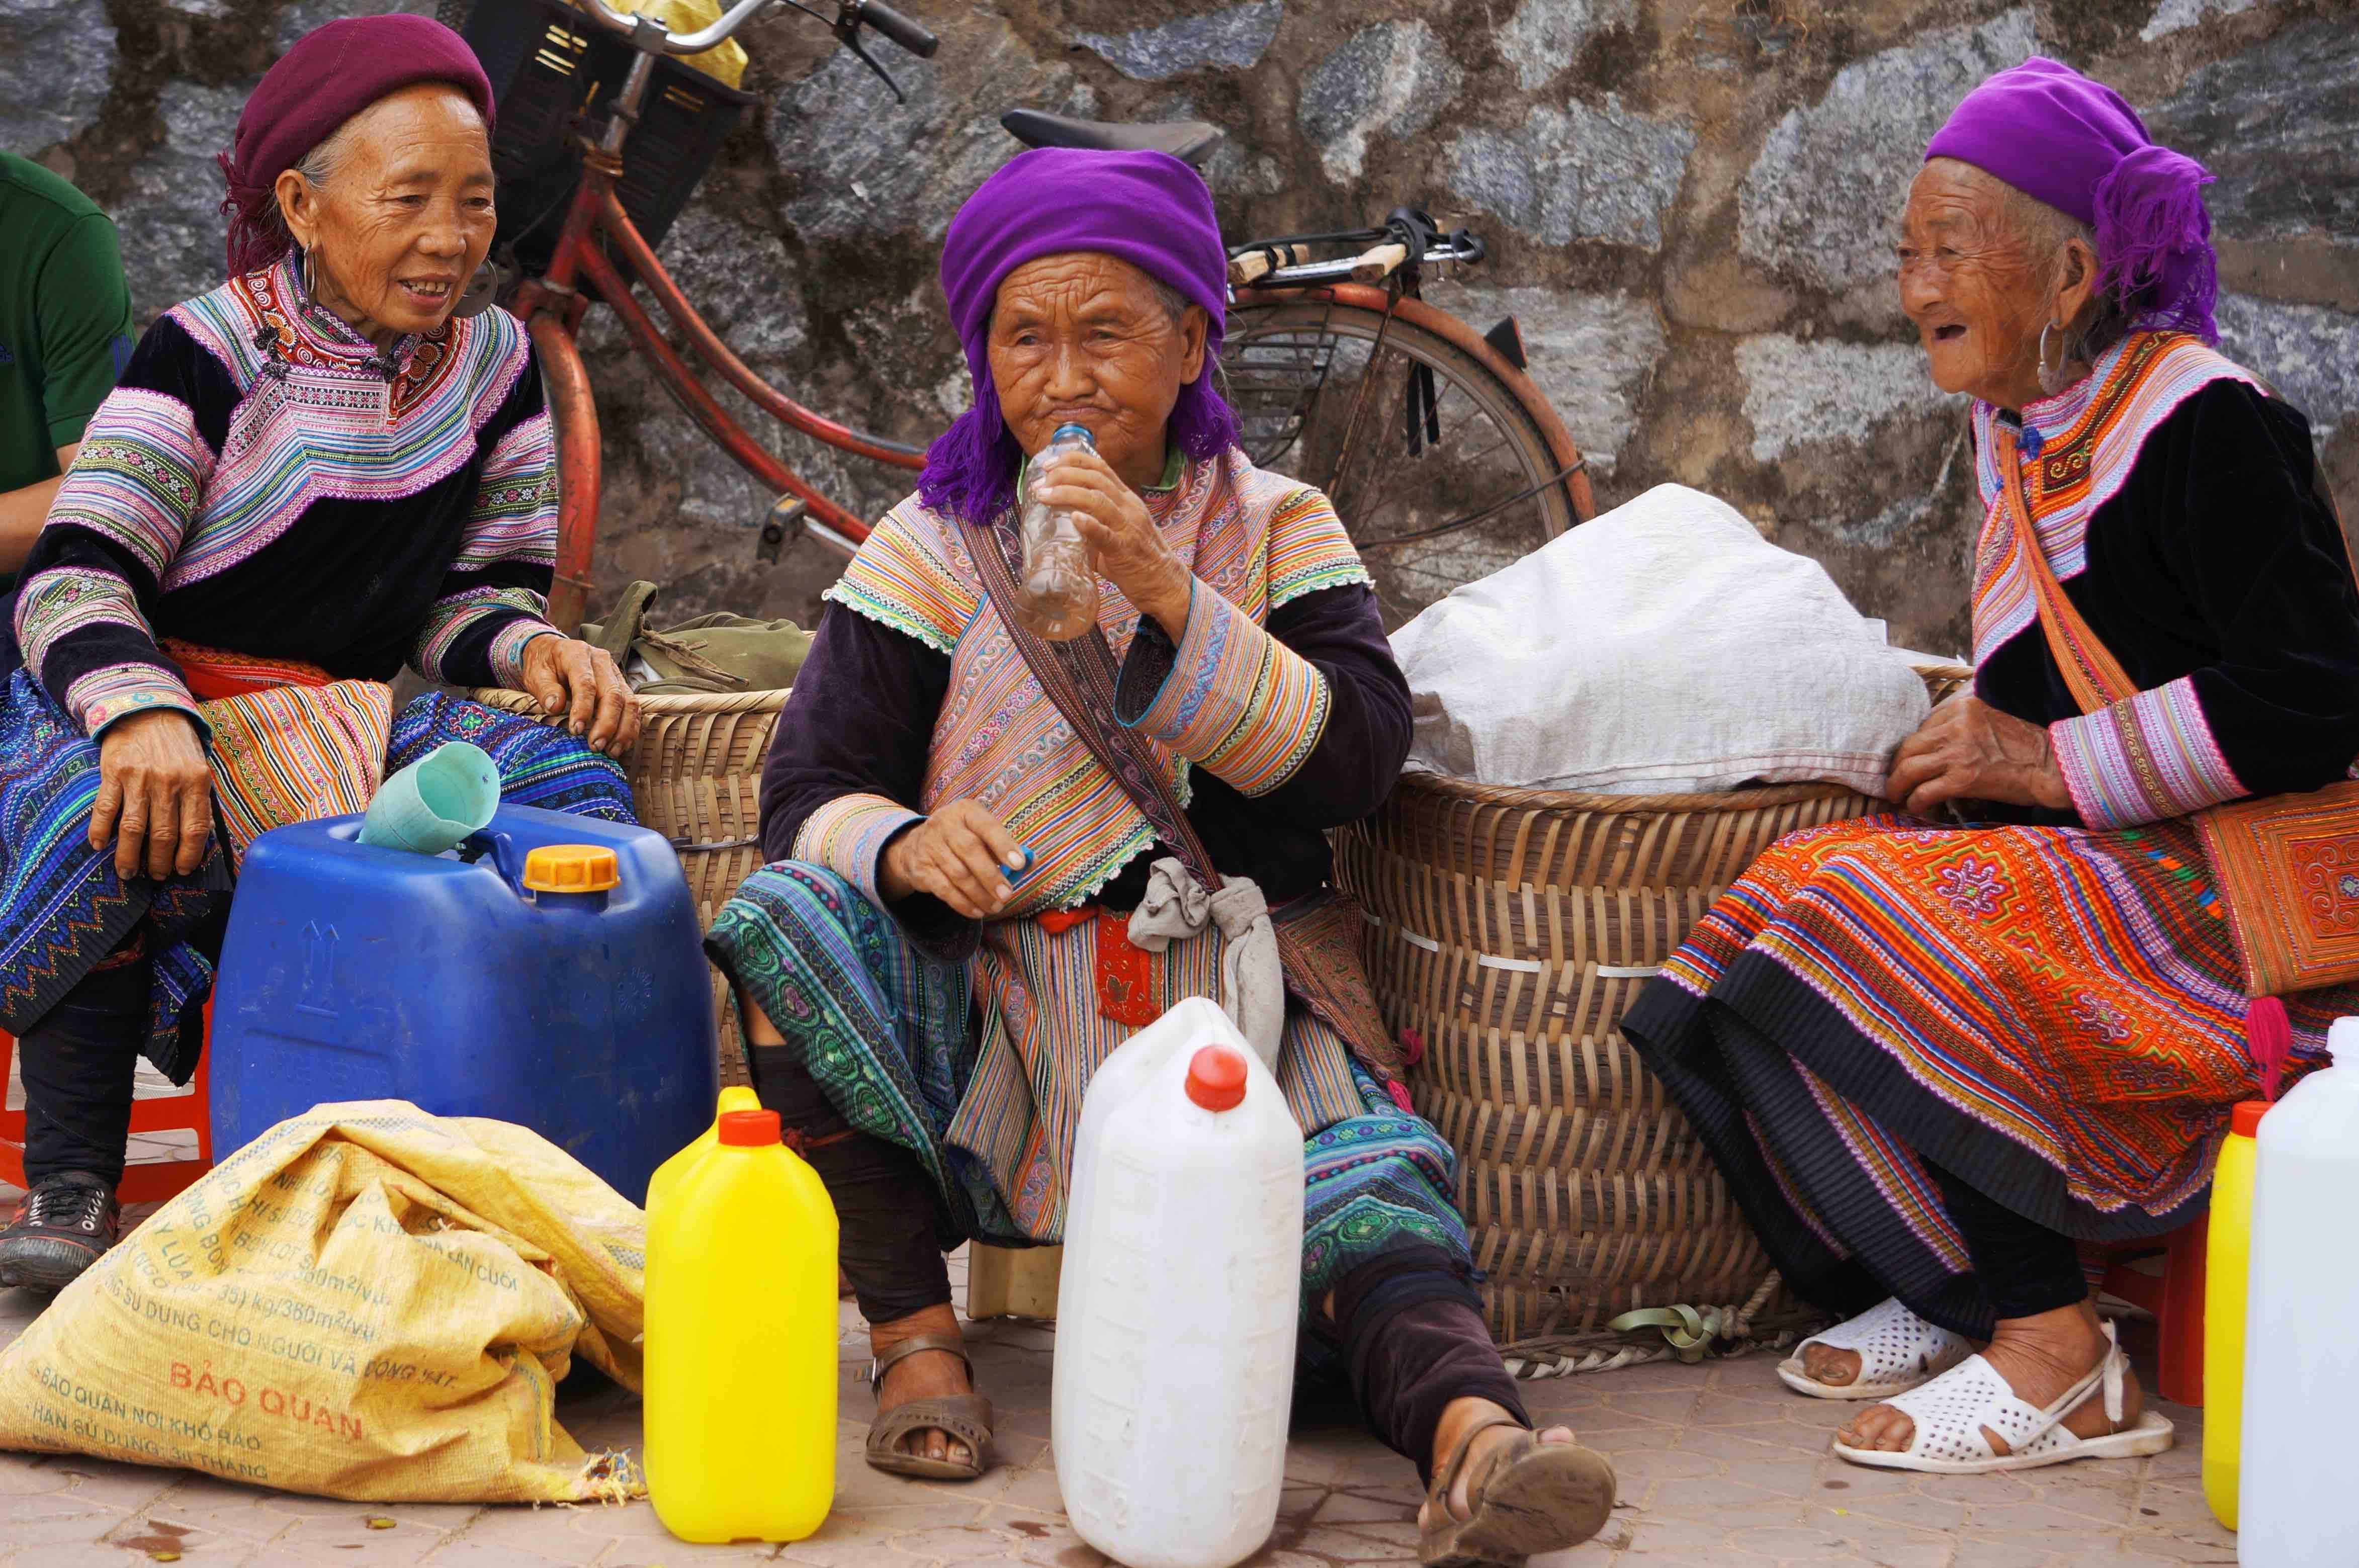 Viaje a Vietnam Mercados Tribales. Sergi González